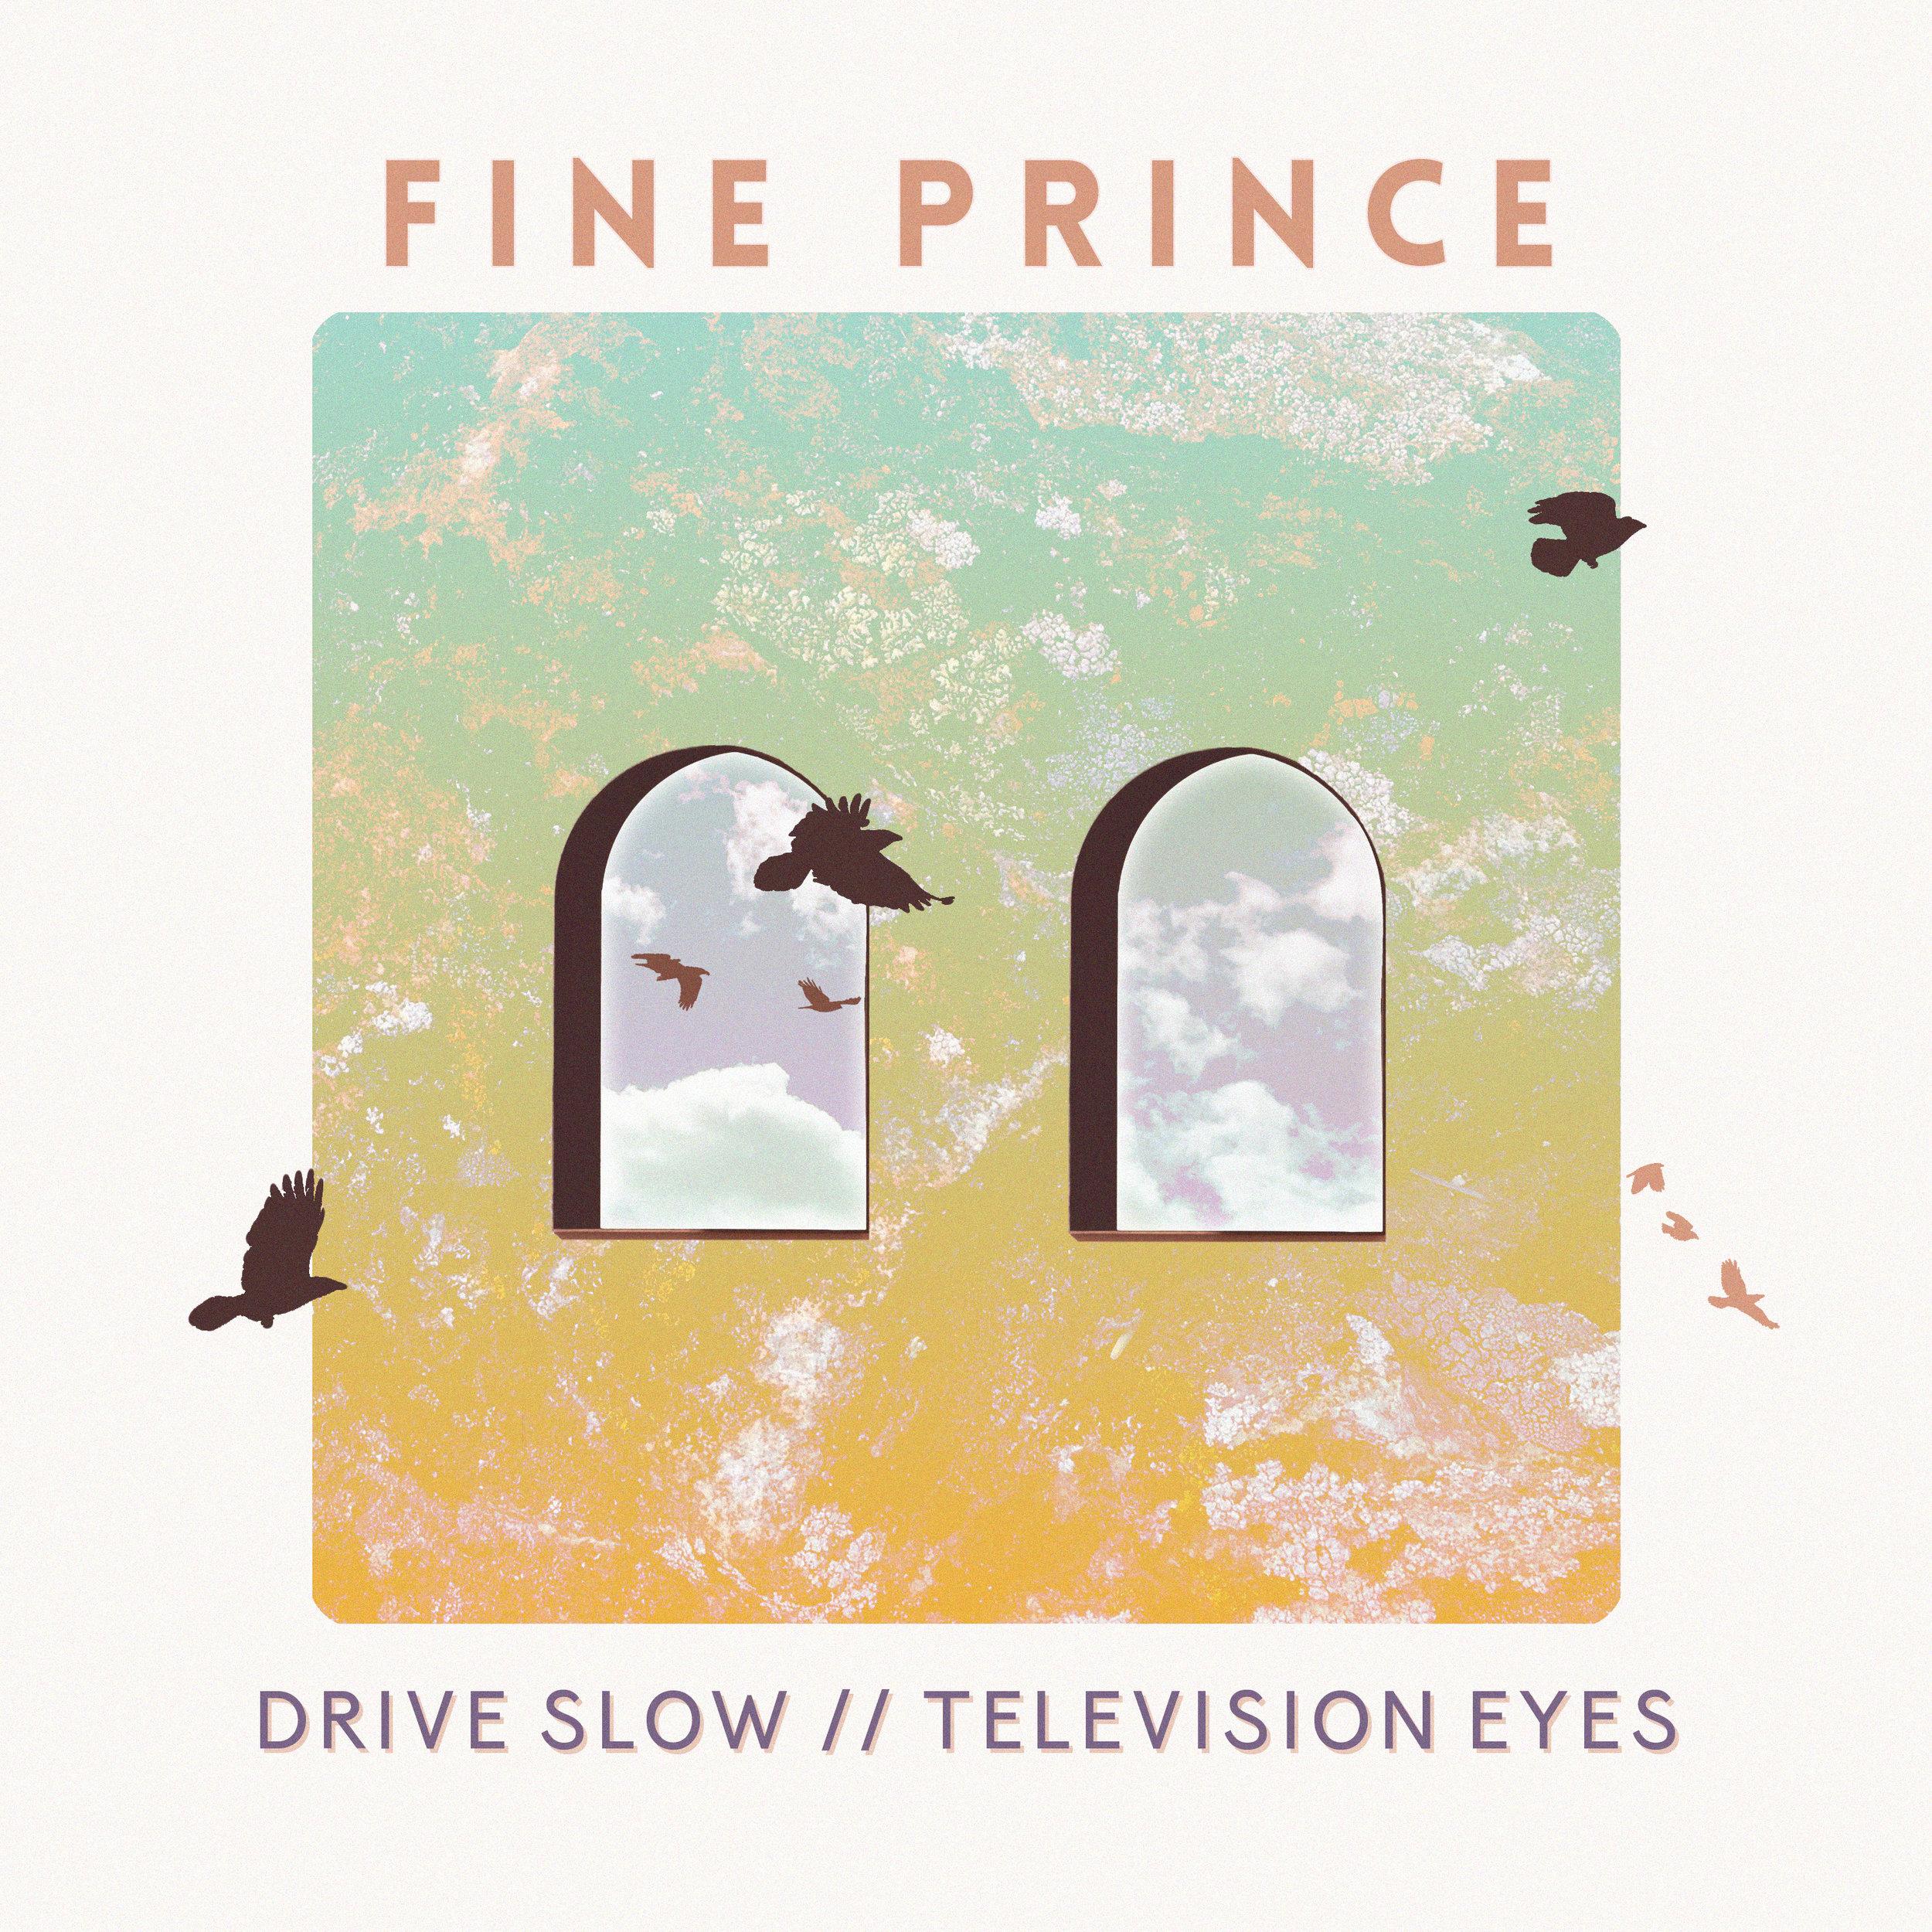 Pre-ordeR Drive Slow // Television Eyes: - BandcampSpotifyiTunes/Apple MusicGooglePlayTidalDeezerAVAILABLE EVERYWHERE SEPTEMBER 20